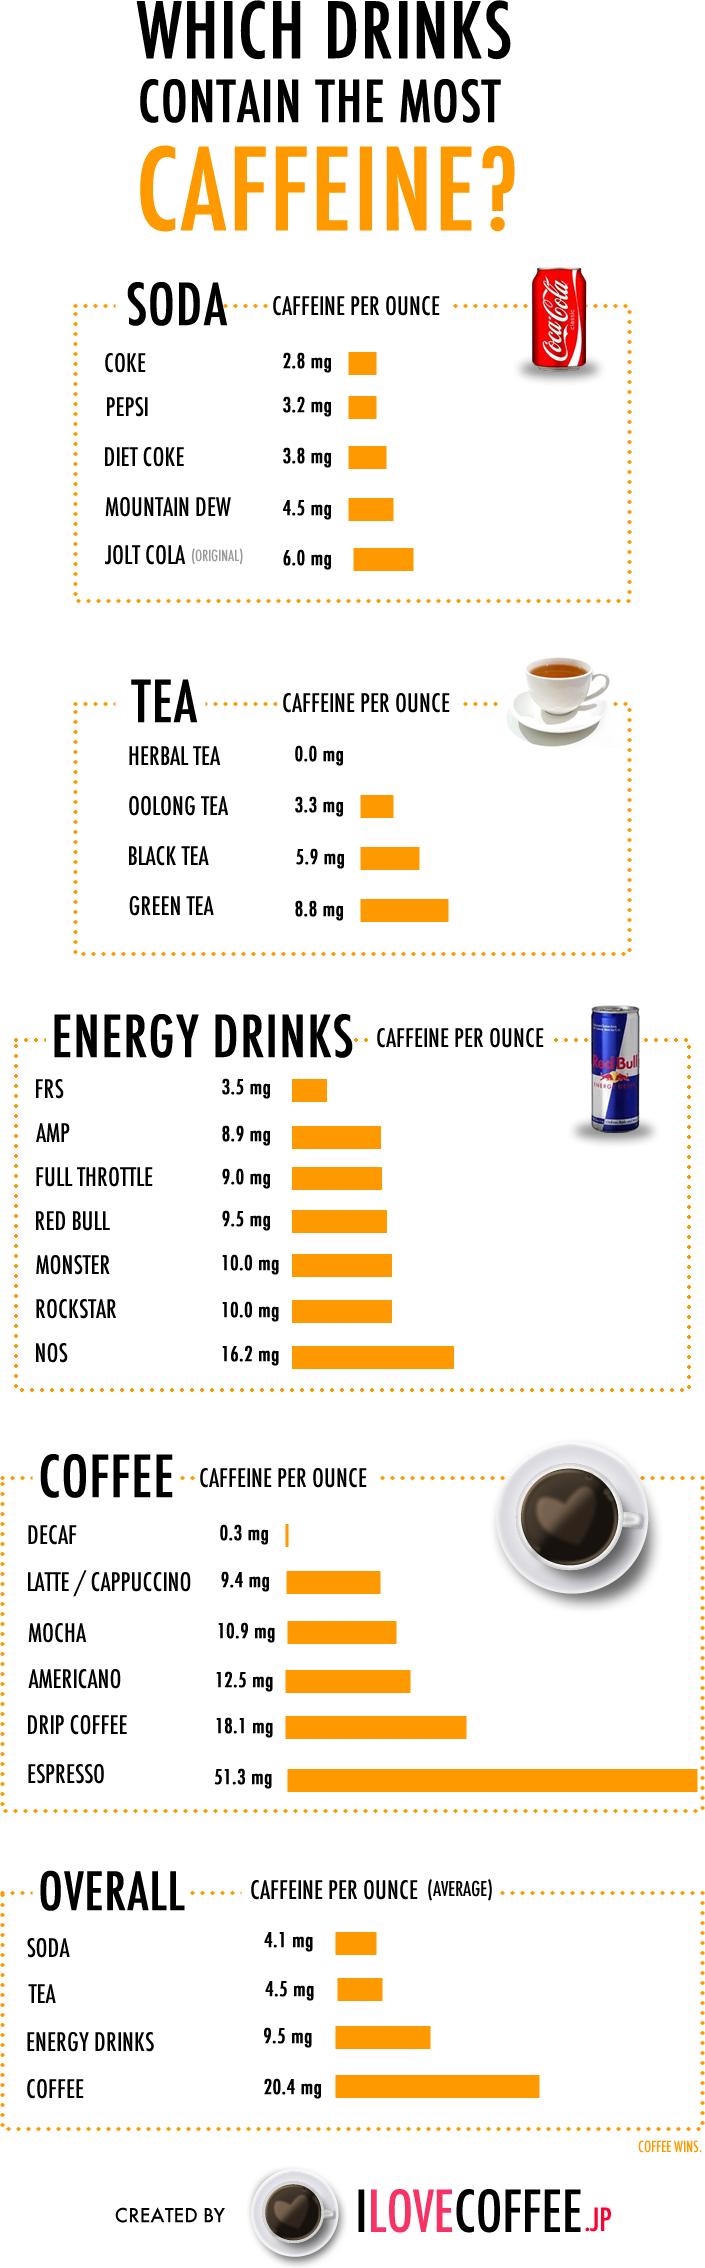 Caffeine Content Positivemed Caffeine Content Caffeine Energy Drinks